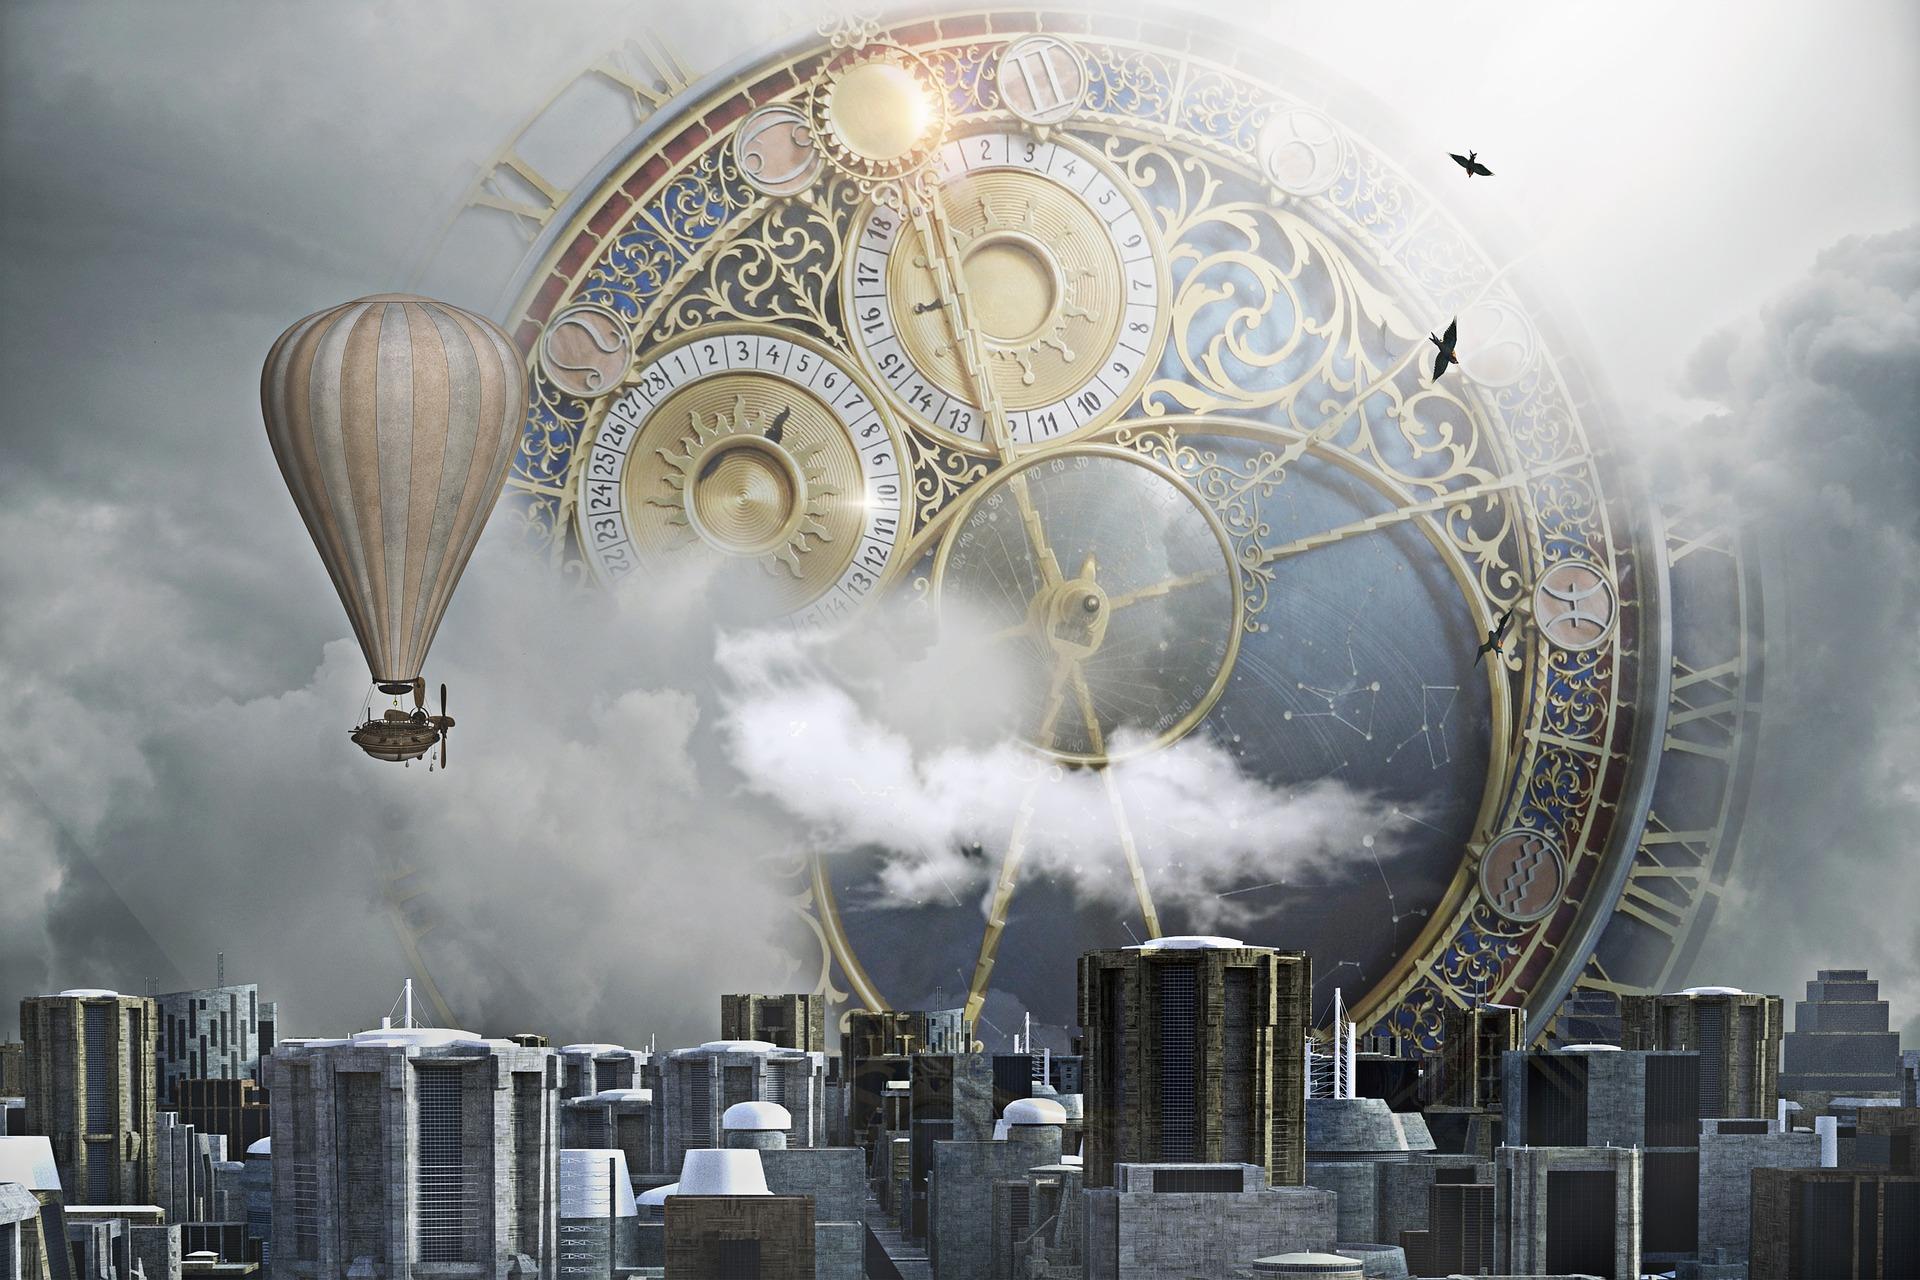 Mystery Babylon - Main Image | Prophecy Investigators